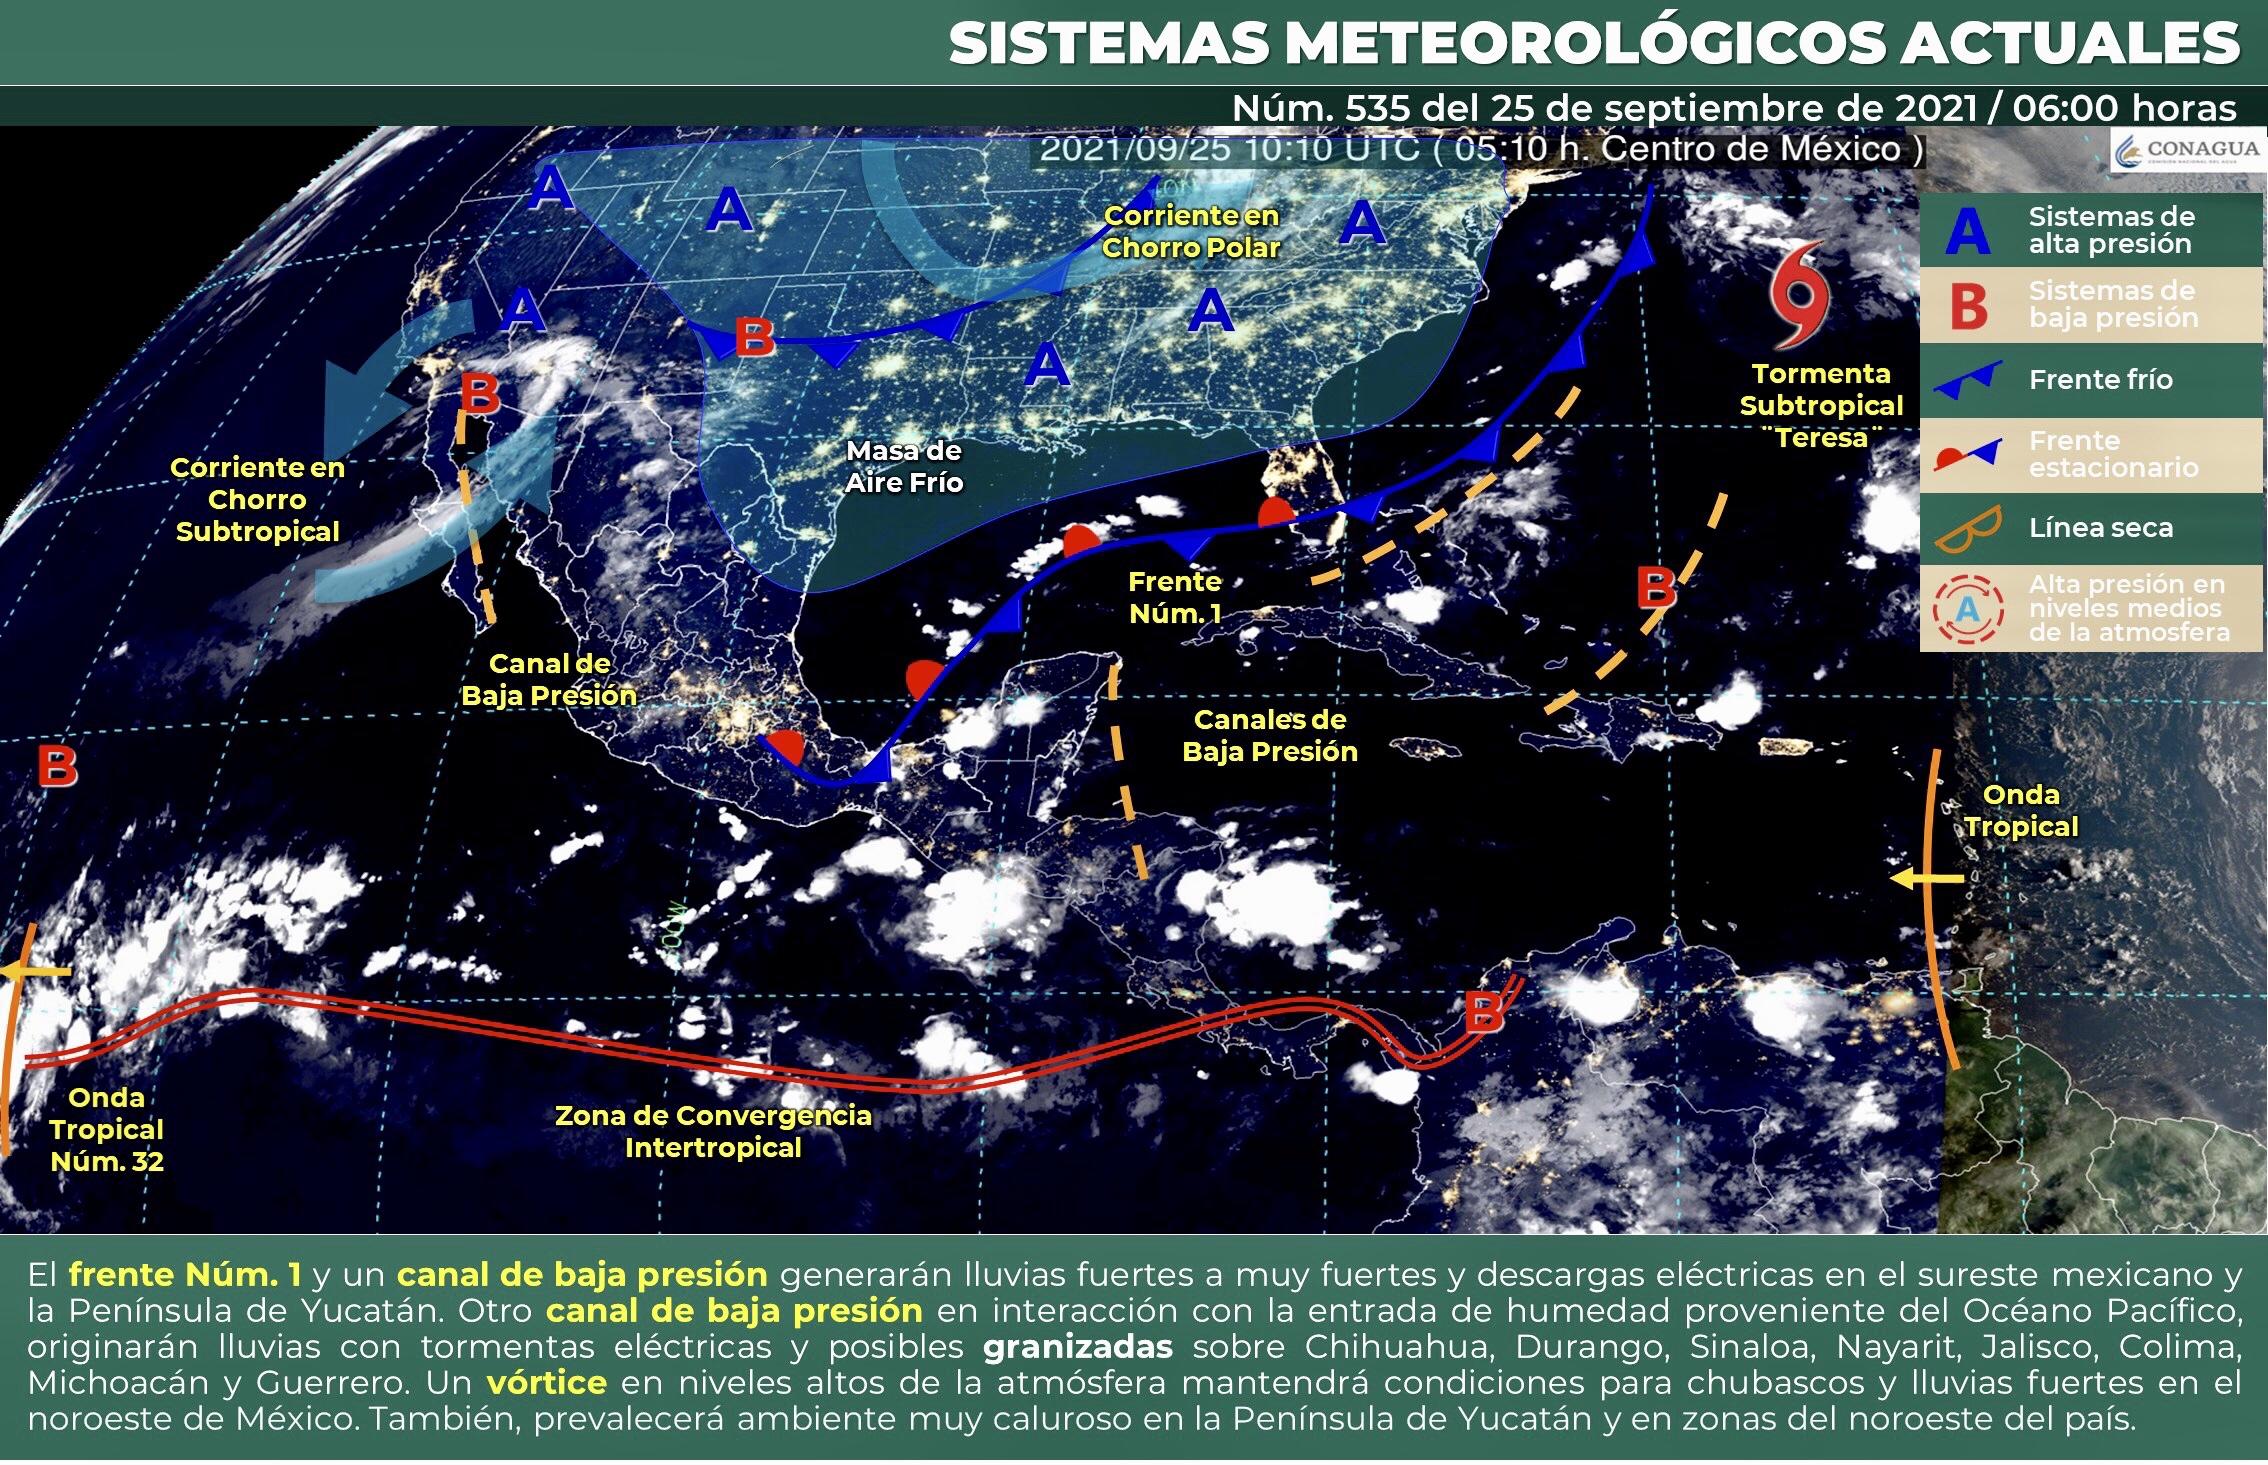 Se pronostica para Colima intervalos de chubascos con lluvias puntuales fuertes.